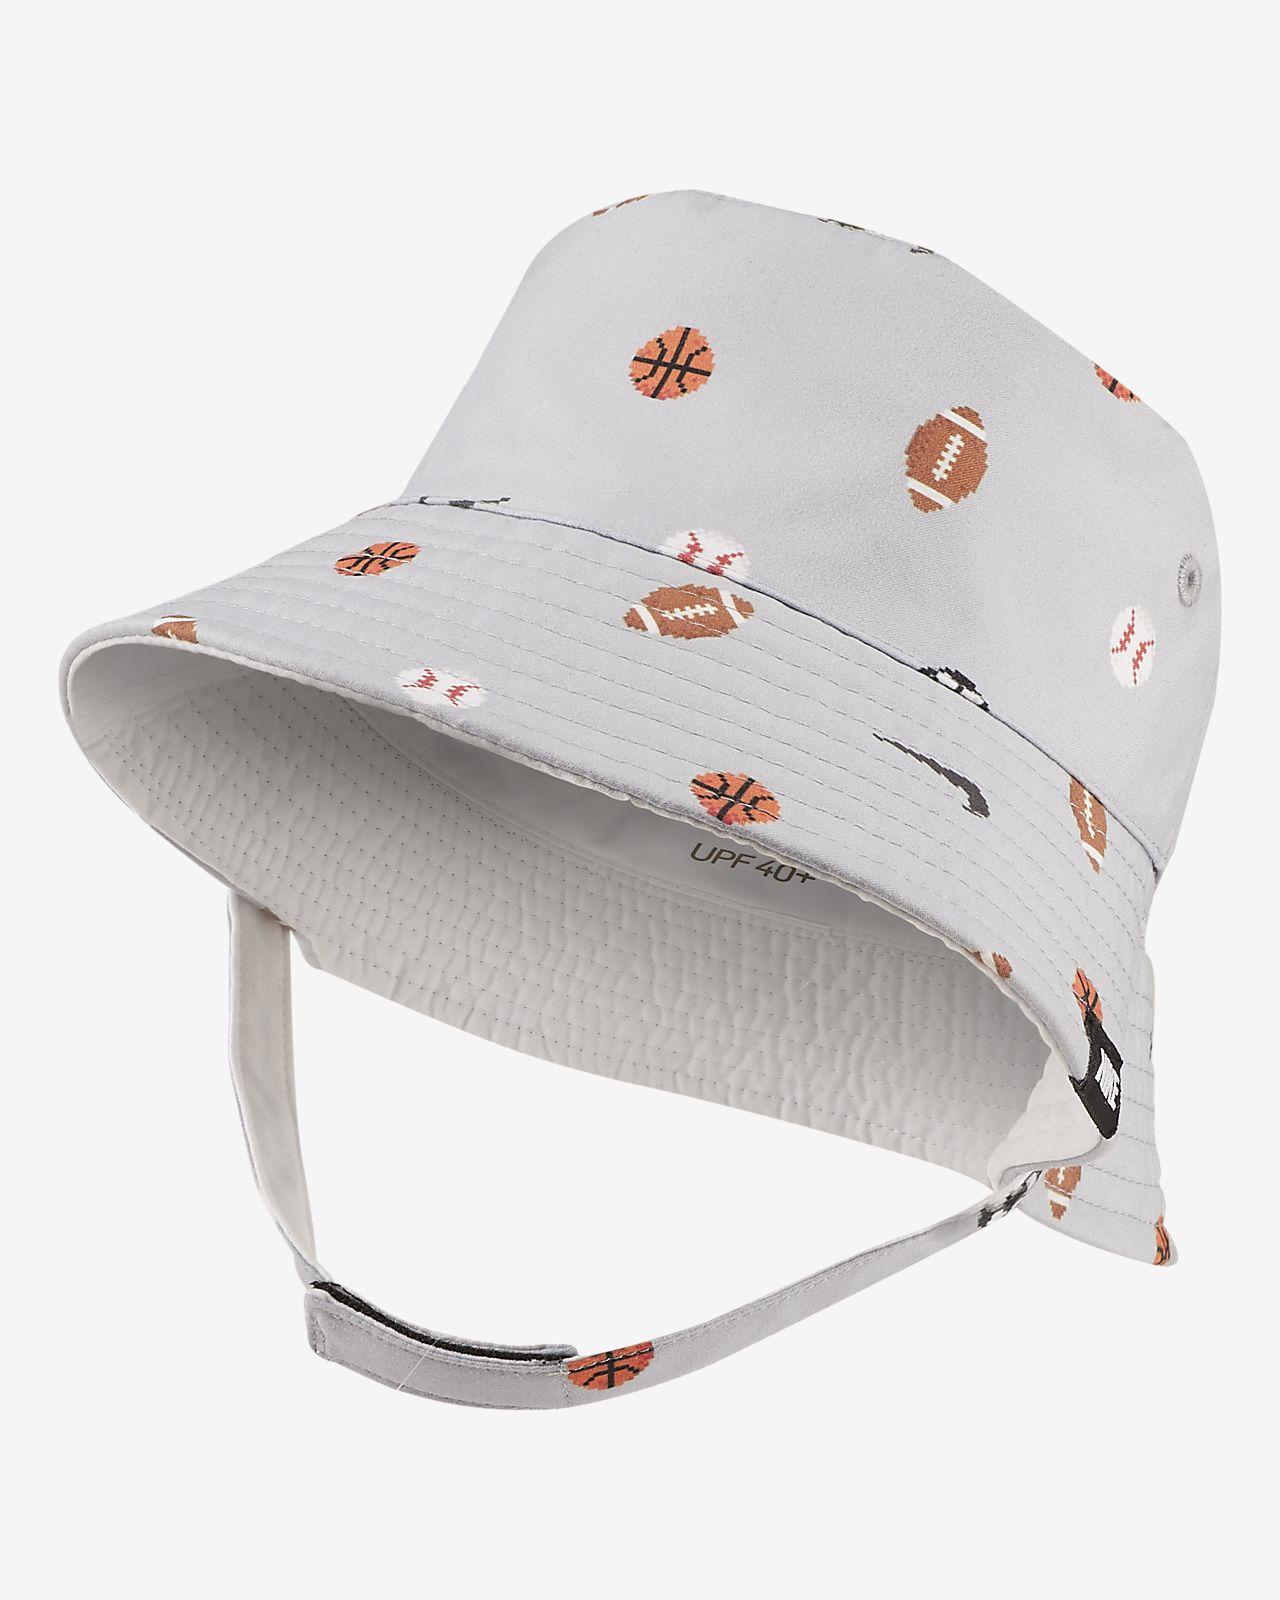 be351cd78 Nike Dri-FIT Toddler Reversible Bucket Hat